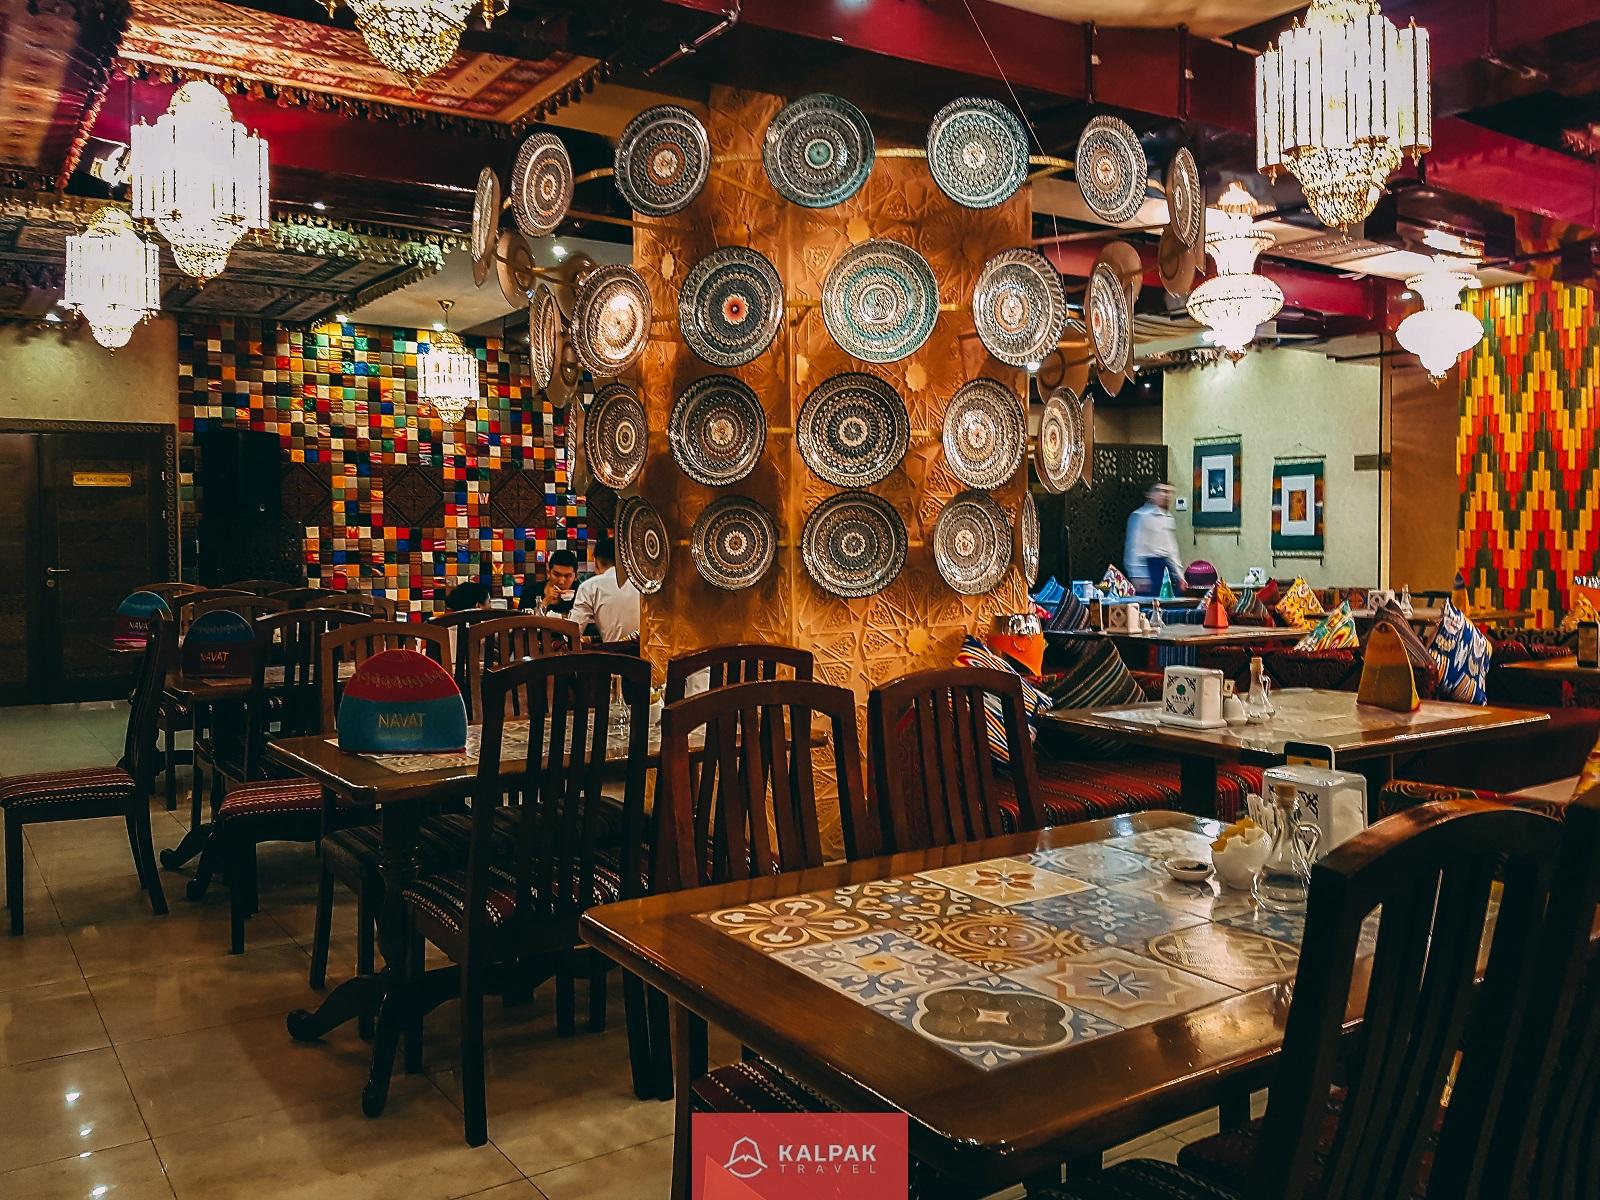 Central Asian restaurant food in Navat